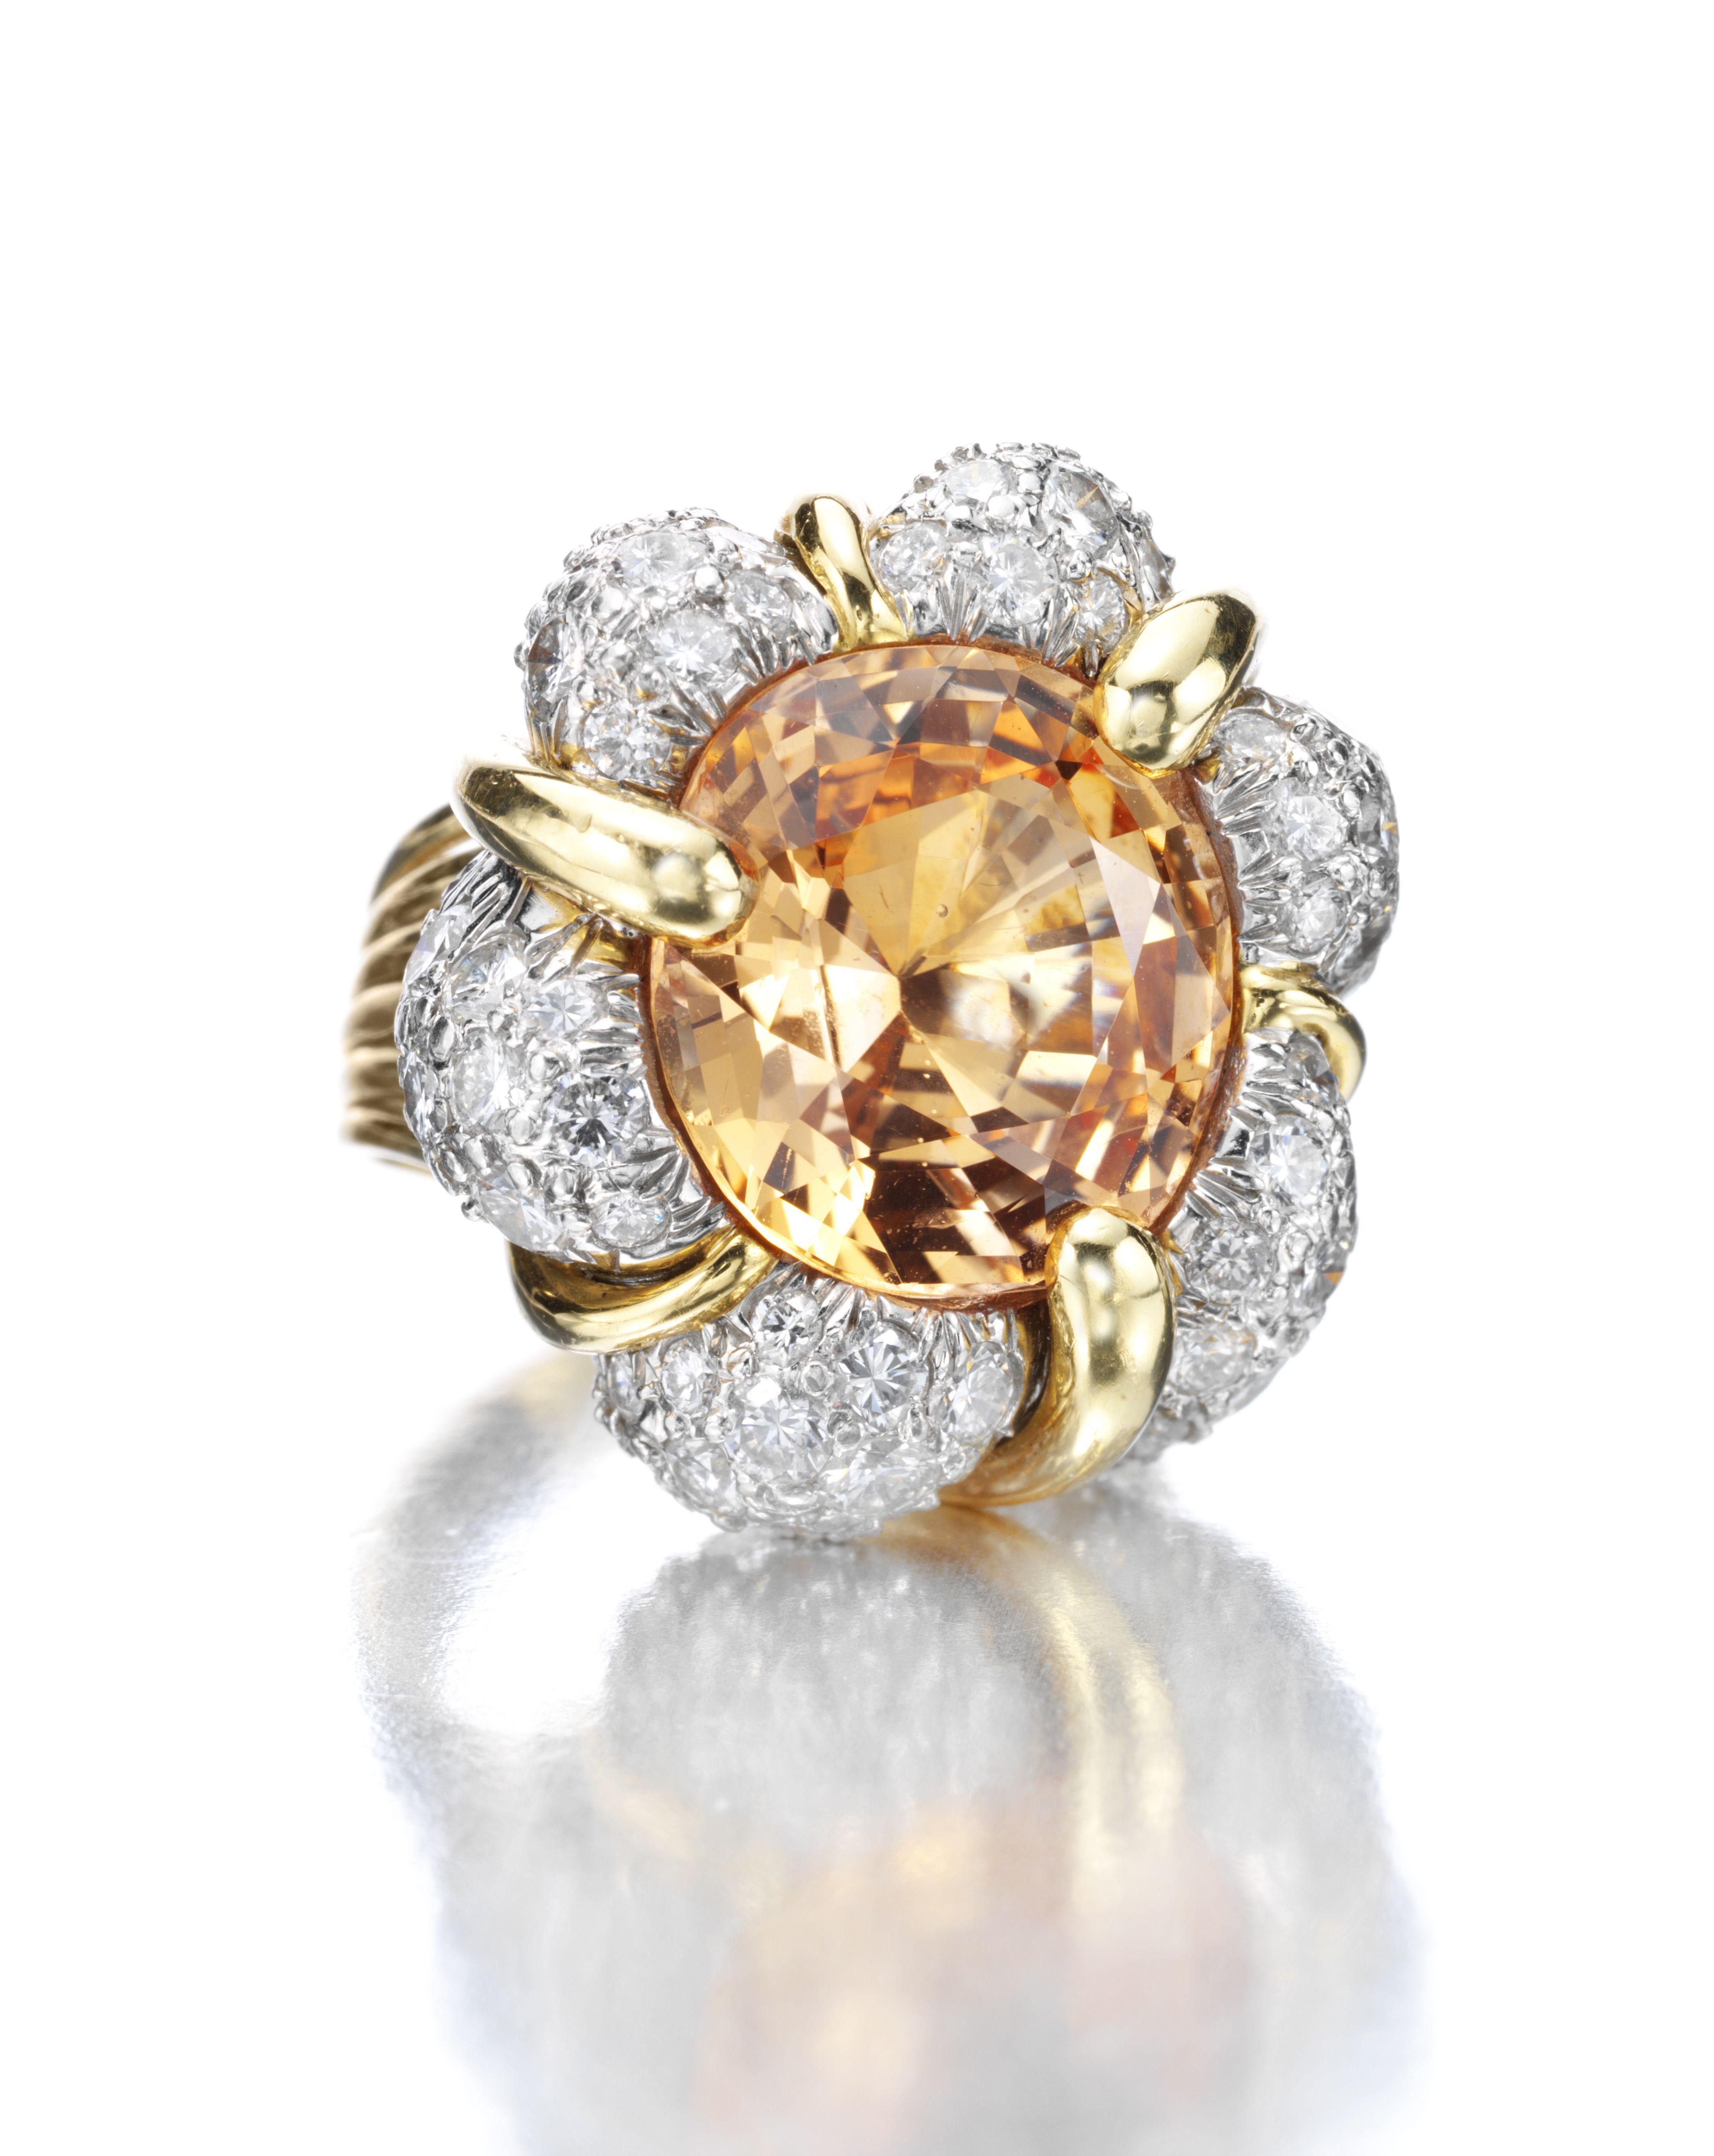 Verdura an unheated padparadscha sapphire and diamond uturbanu ring